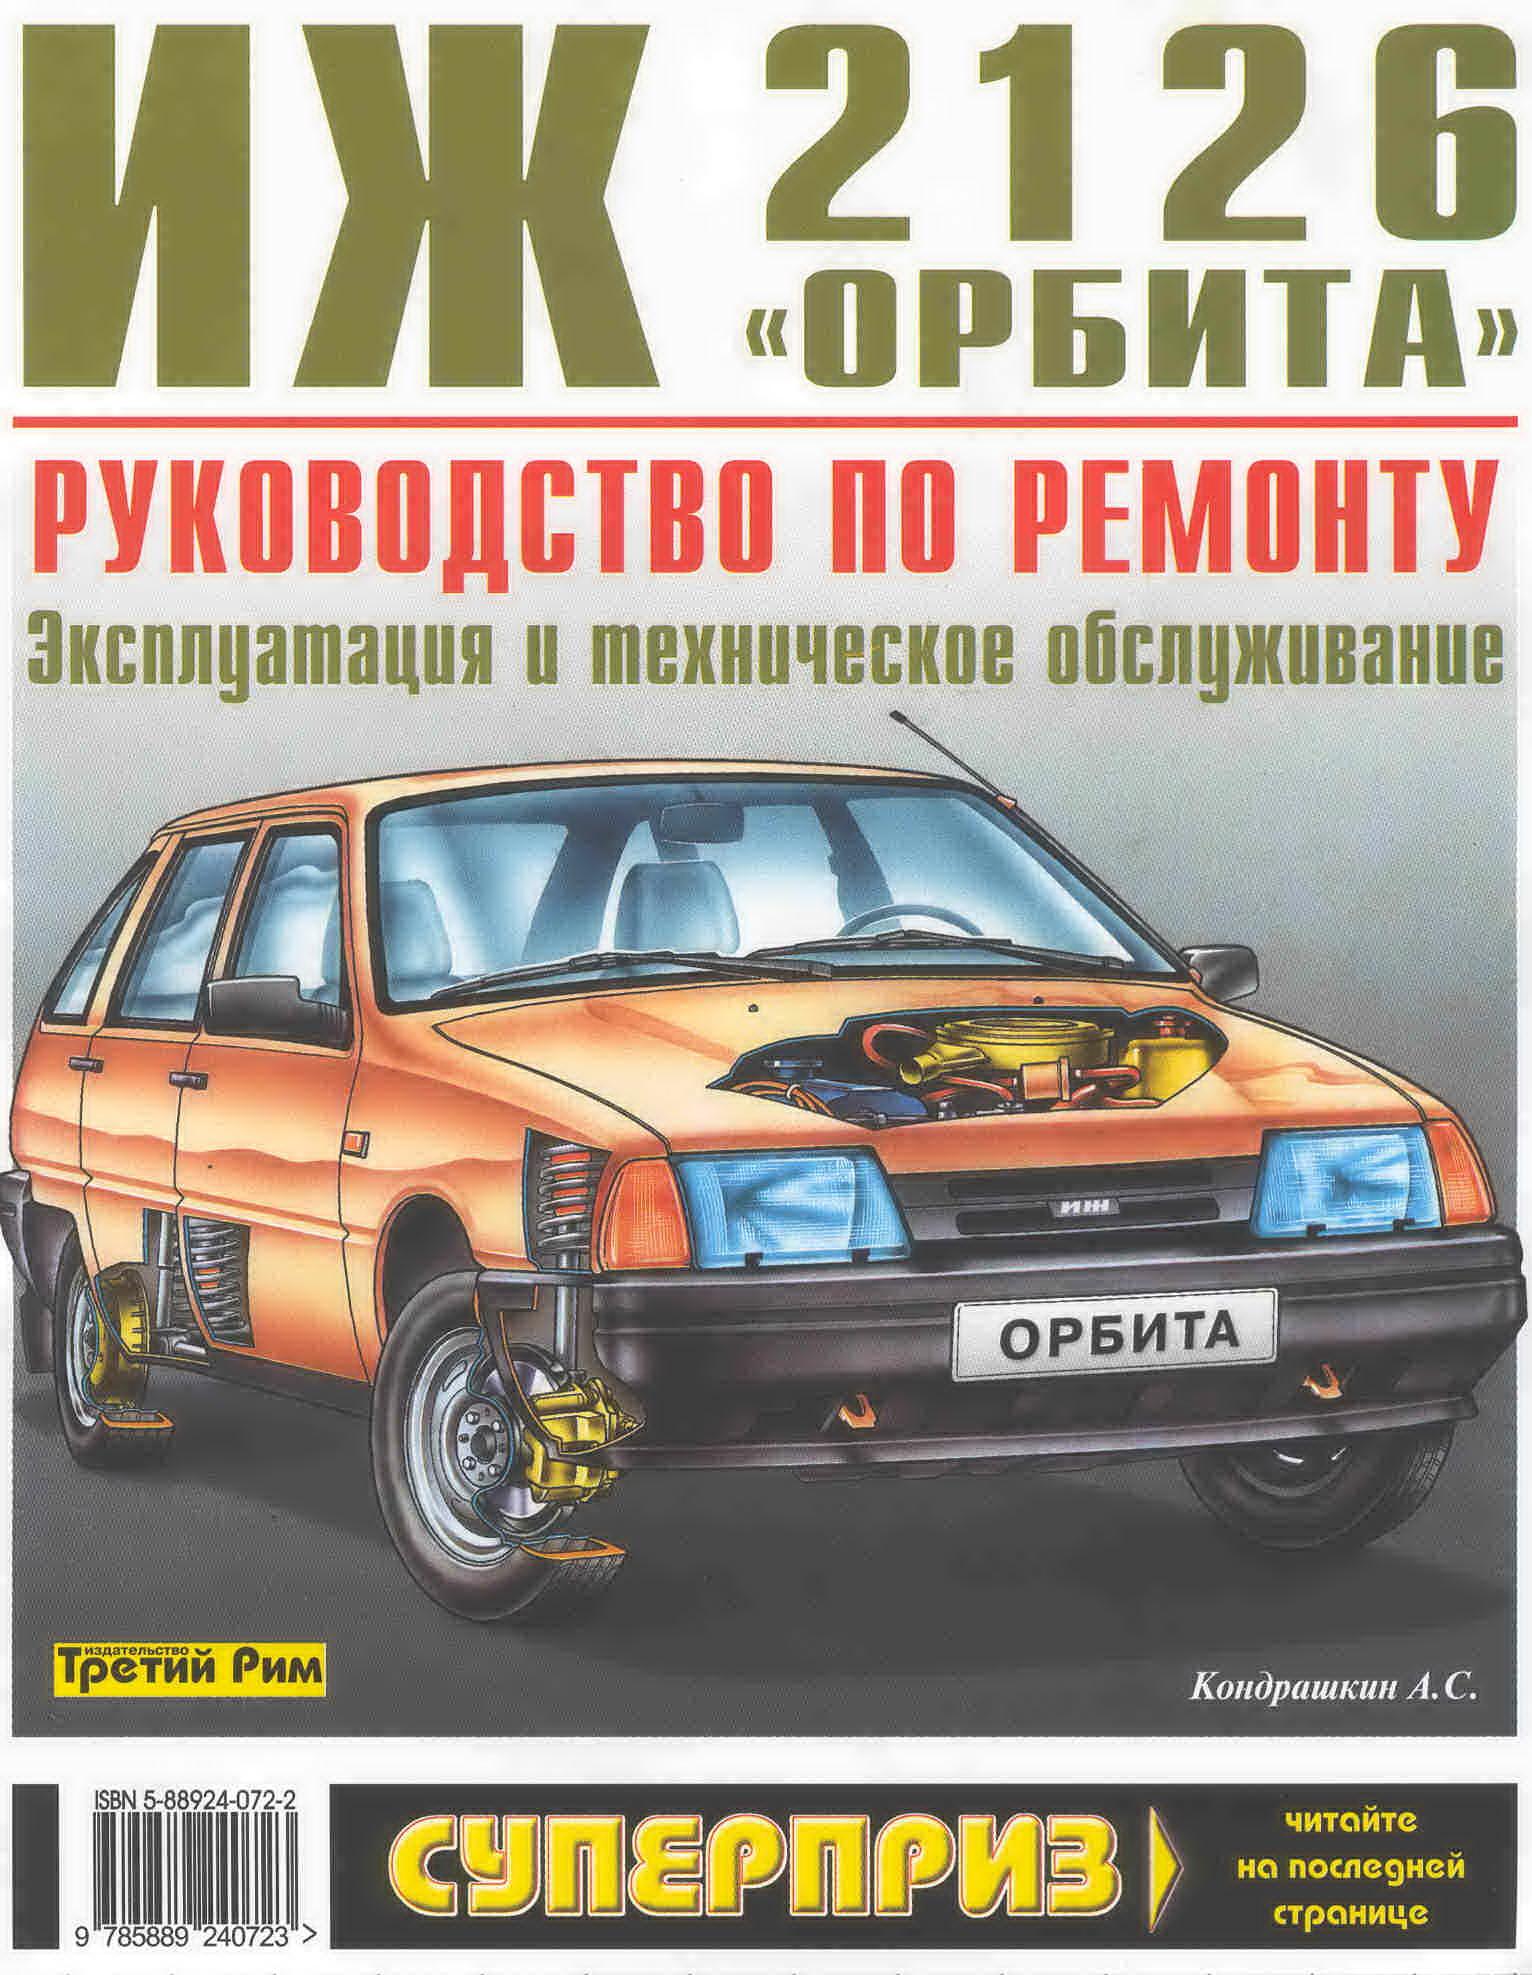 Ремонт Эксплуатация Москвич 412